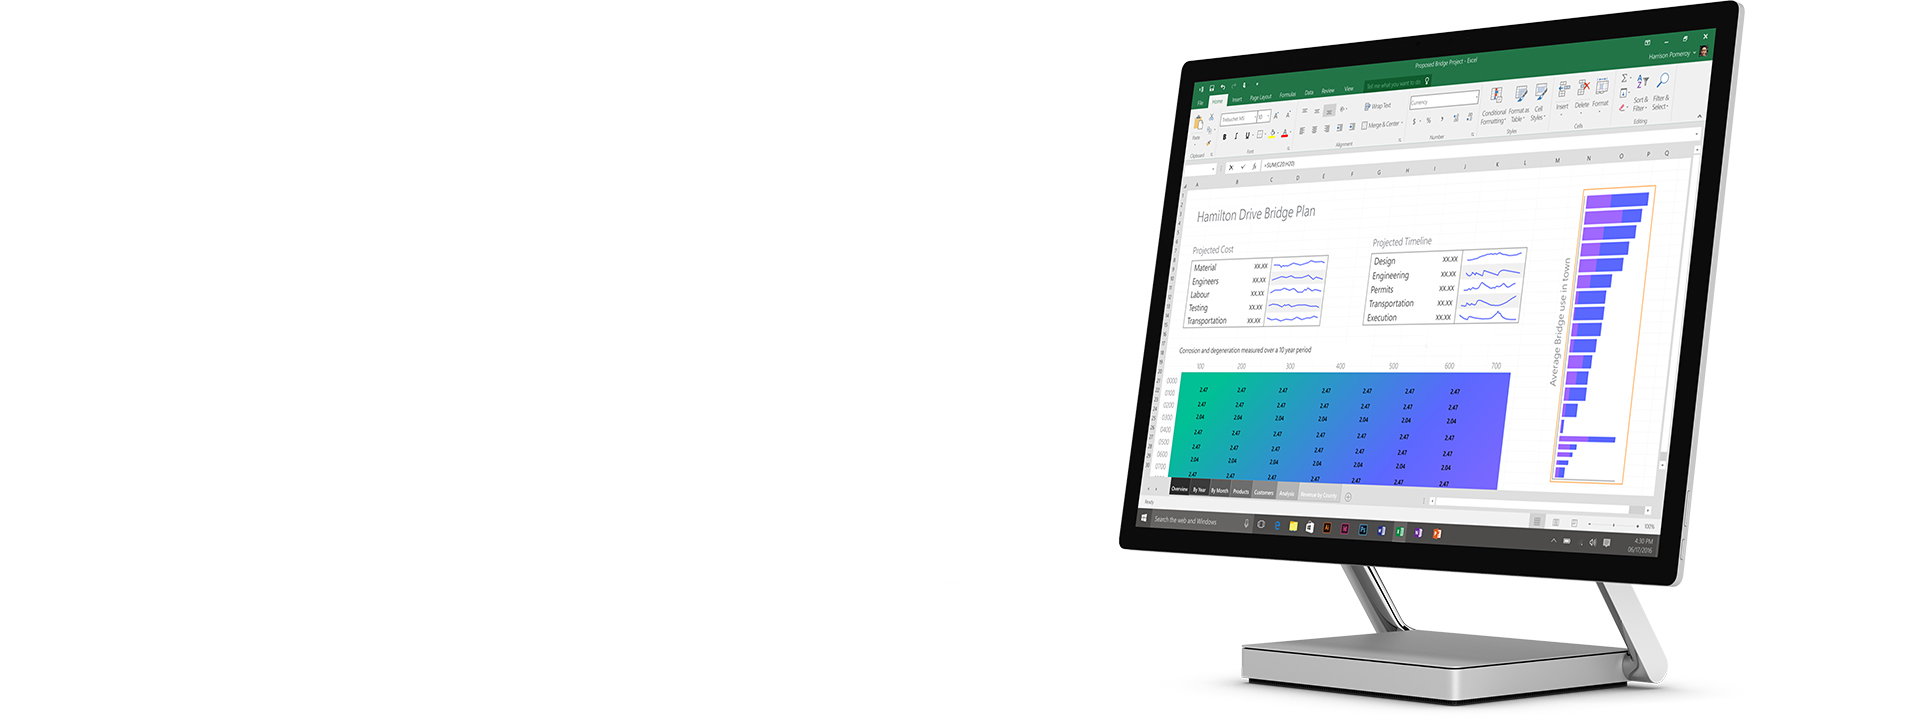 Surface Studio i skrivbordsläge med Excel öppet på skärmen